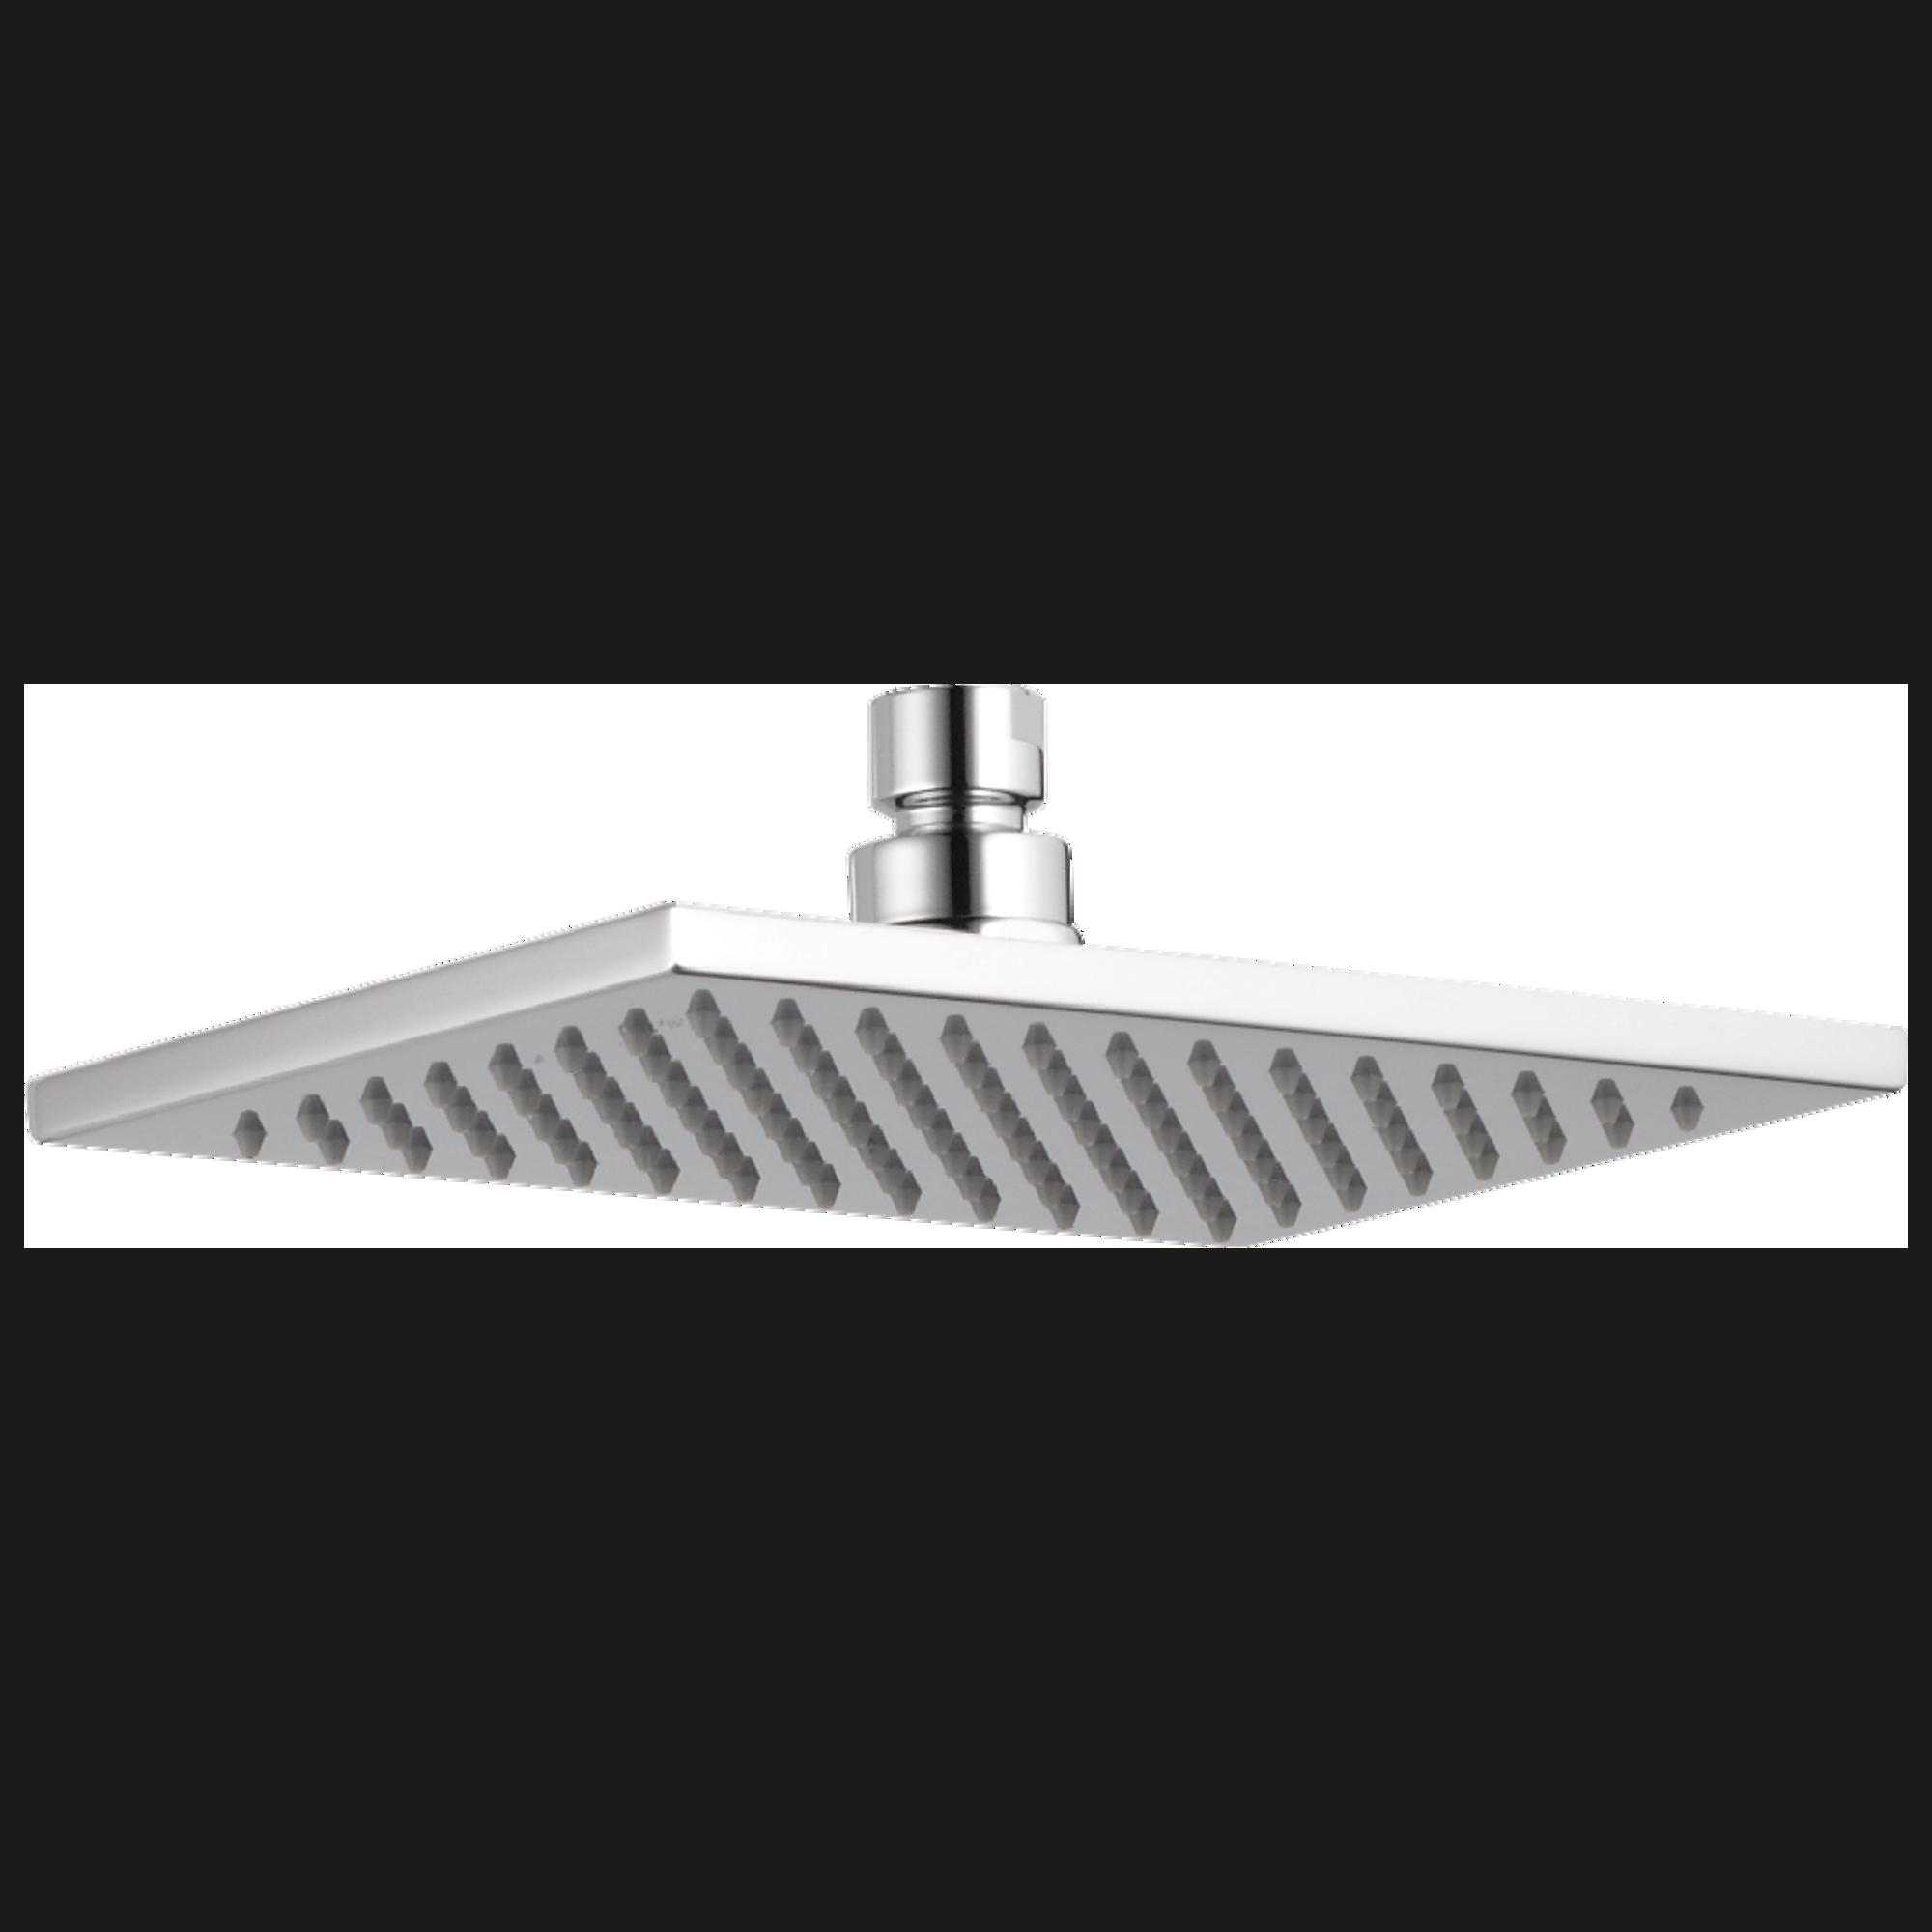 Delta Faucet Rp62955 Single Setting Raincan Shower Head Chrome